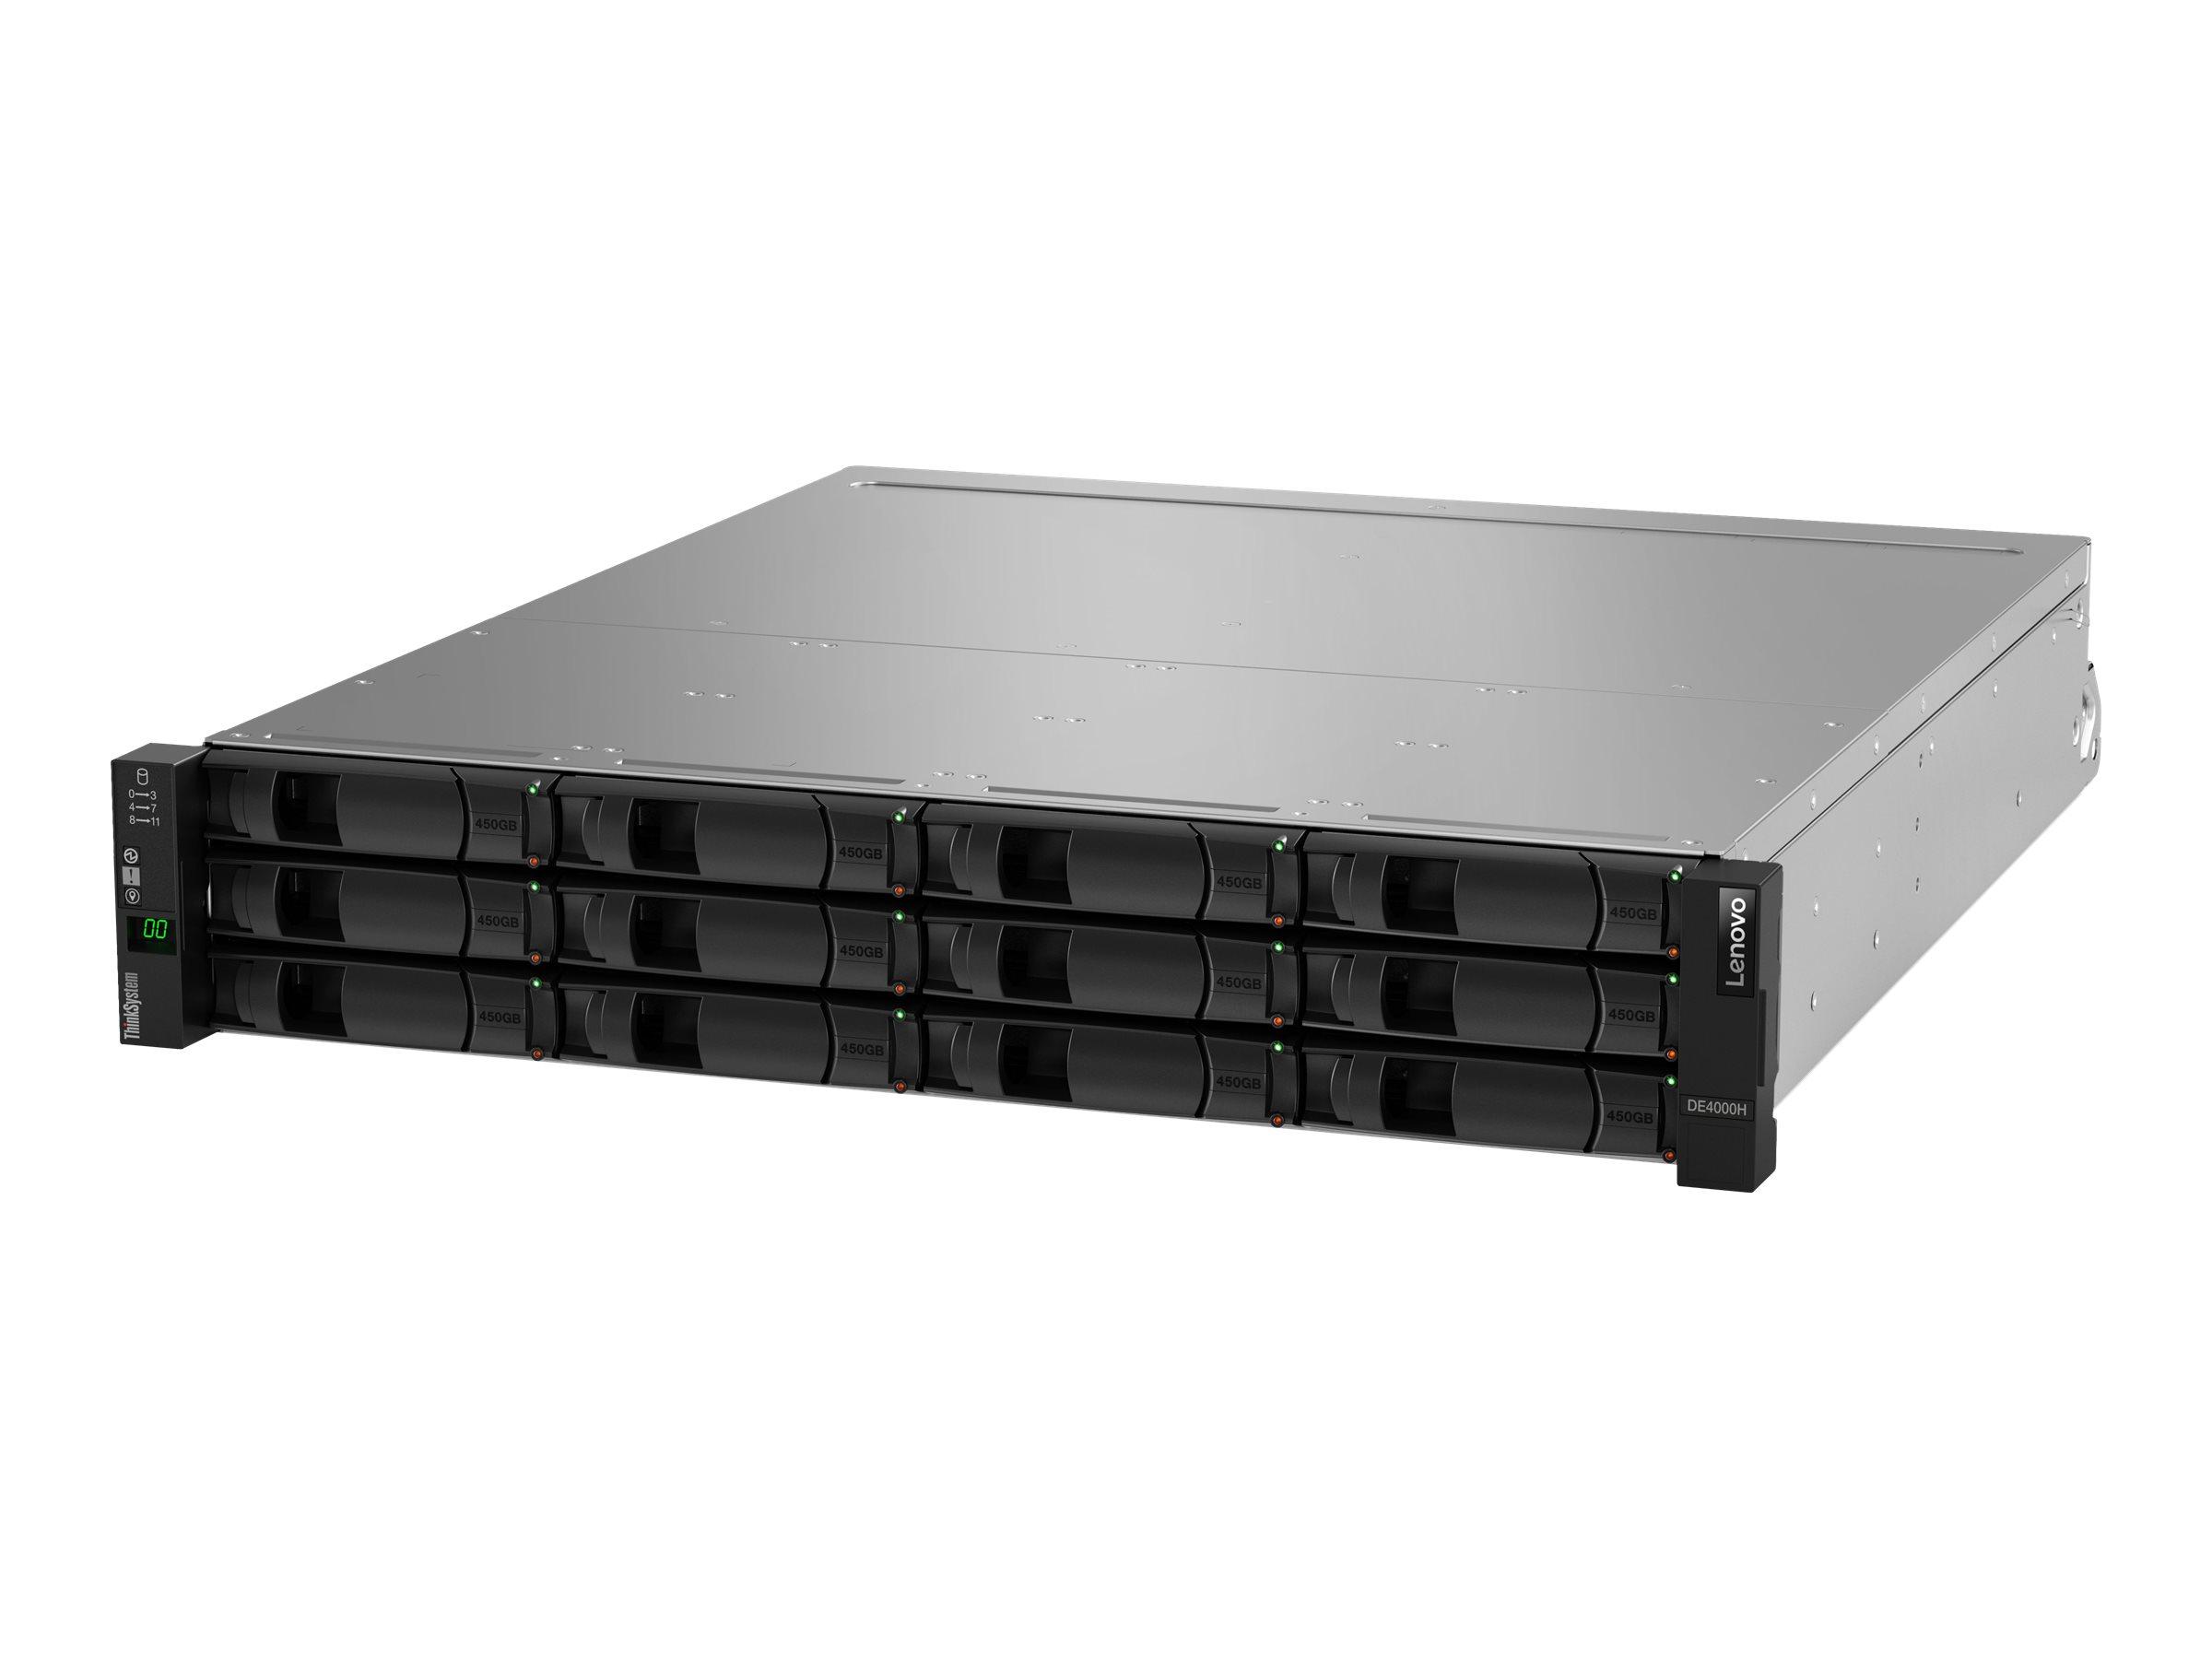 Lenovo ThinkSystem DE4000H Hybrid 2U12 LFF controller enclosure - Festplatten-Array - 12 Schächte (SAS-3) - 16Gb Fibre Channel (